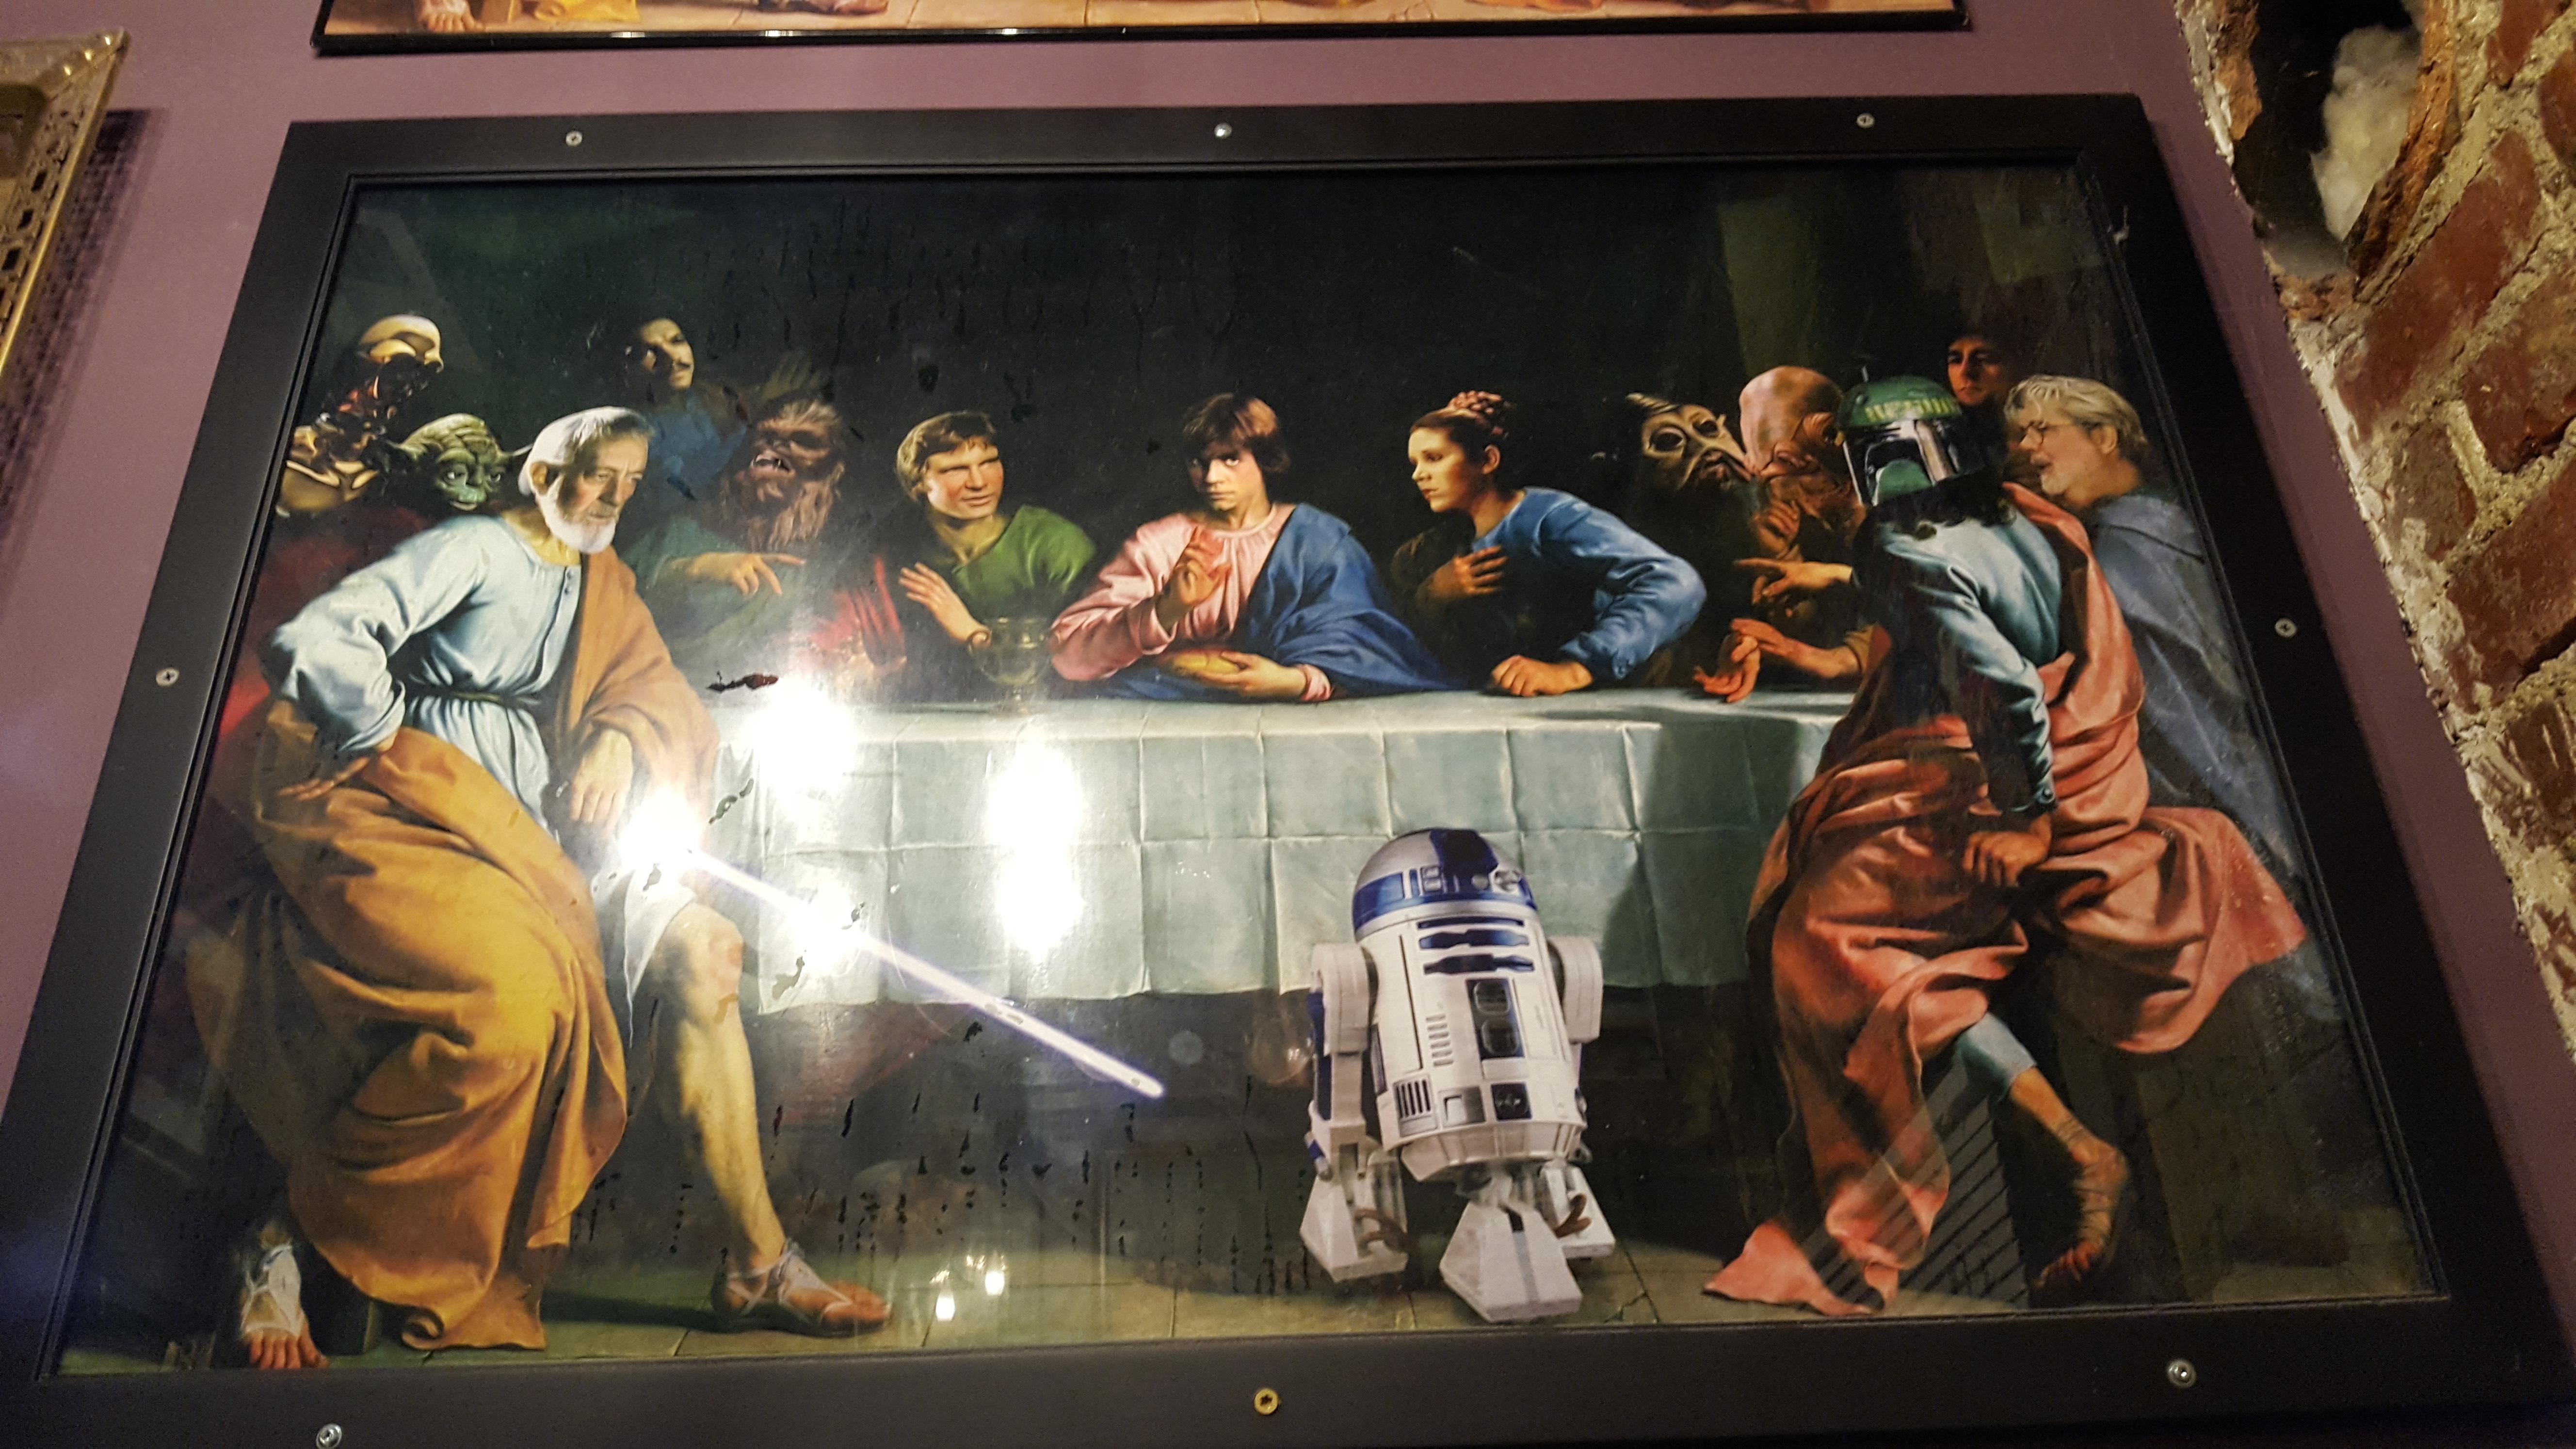 Last Supper Star Wars Posted By John Walker